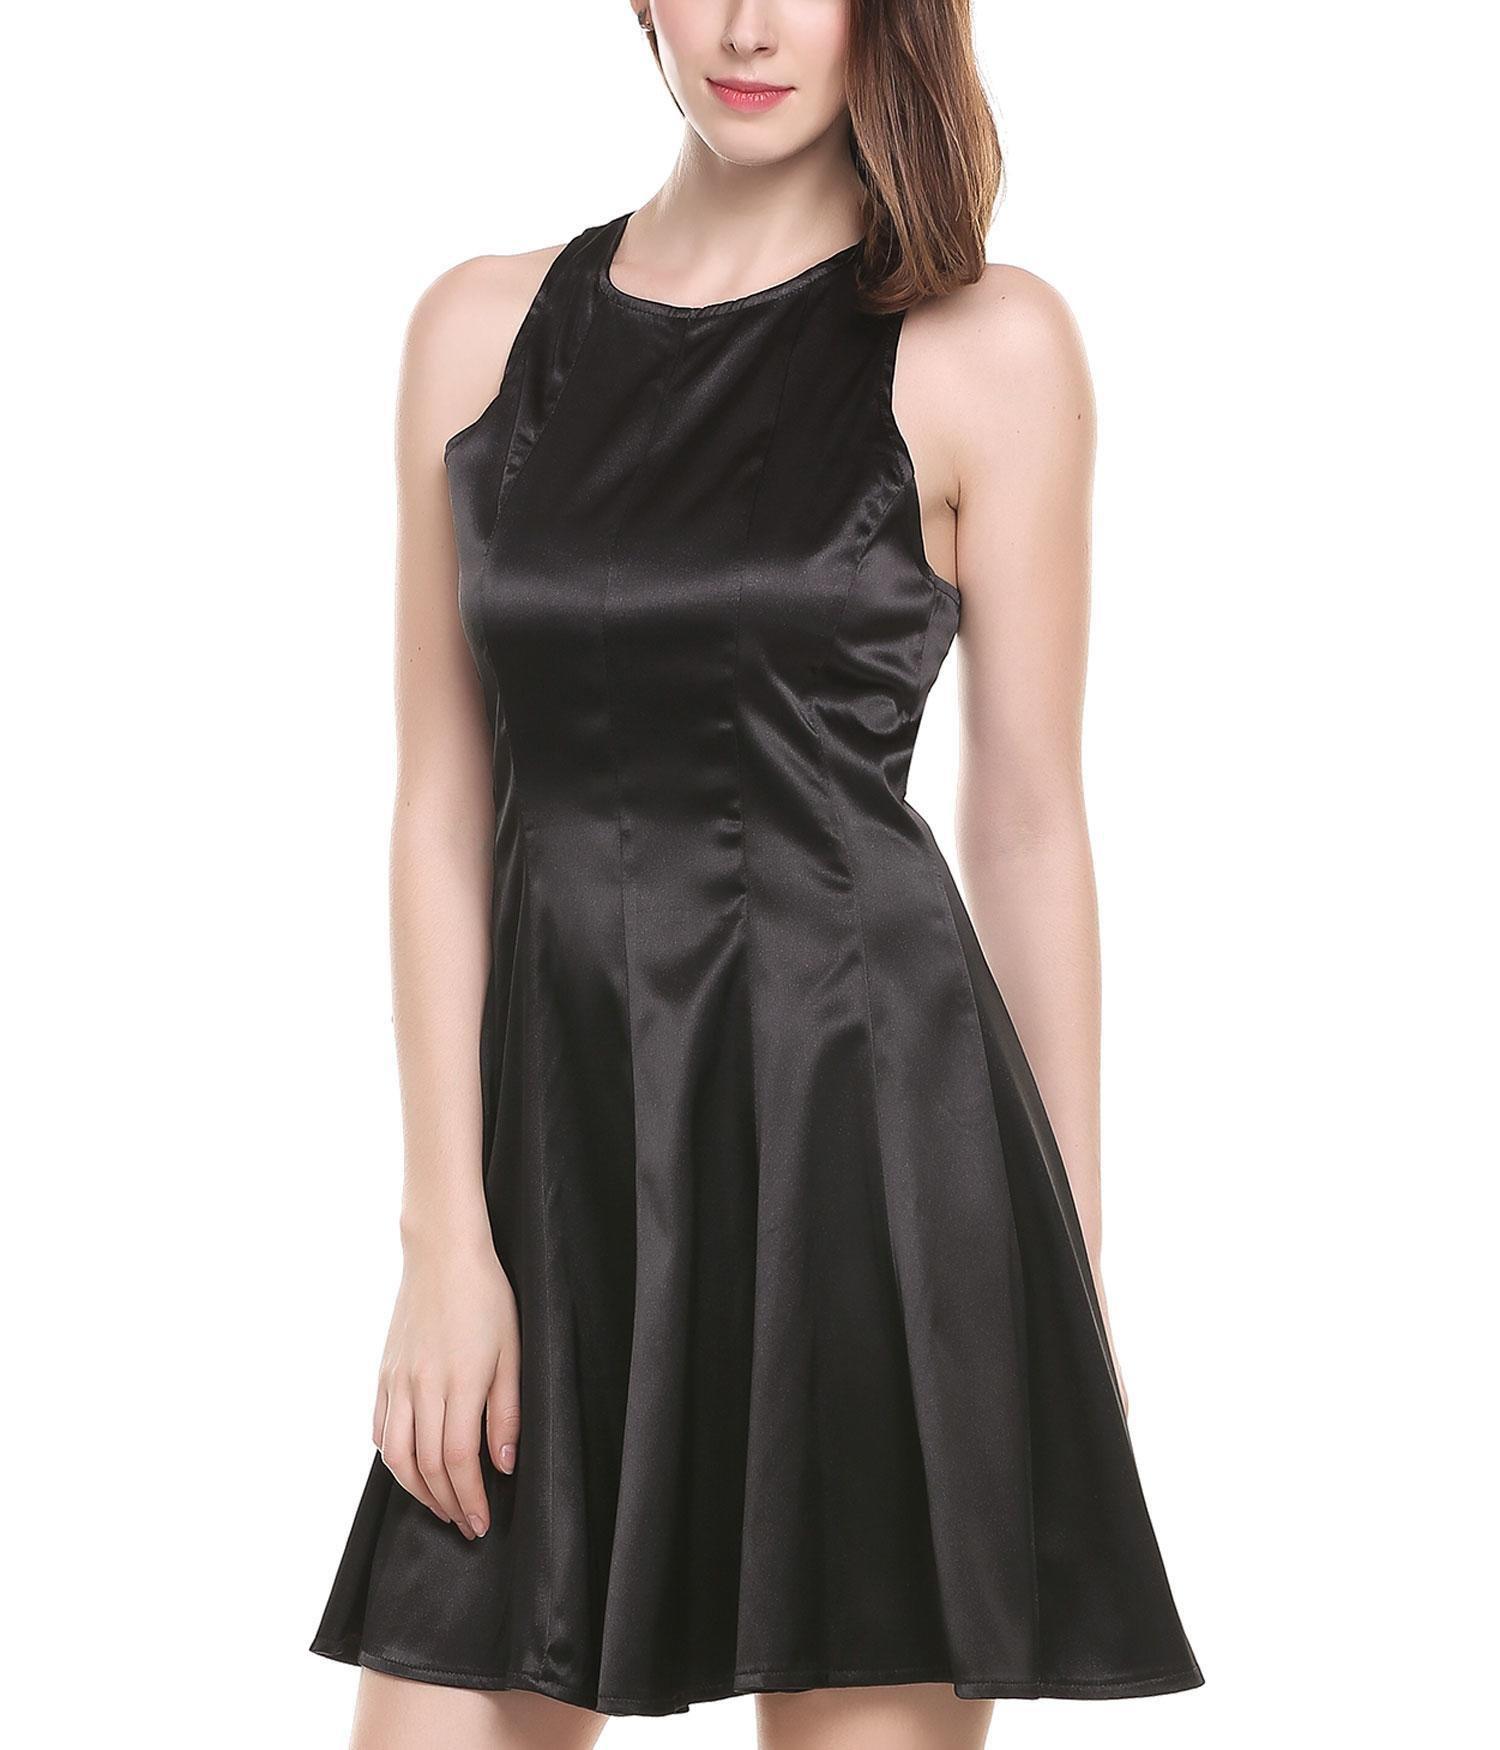 ANGVNS Sexy Sleeveless Halter Neck Short Club Dress Black L